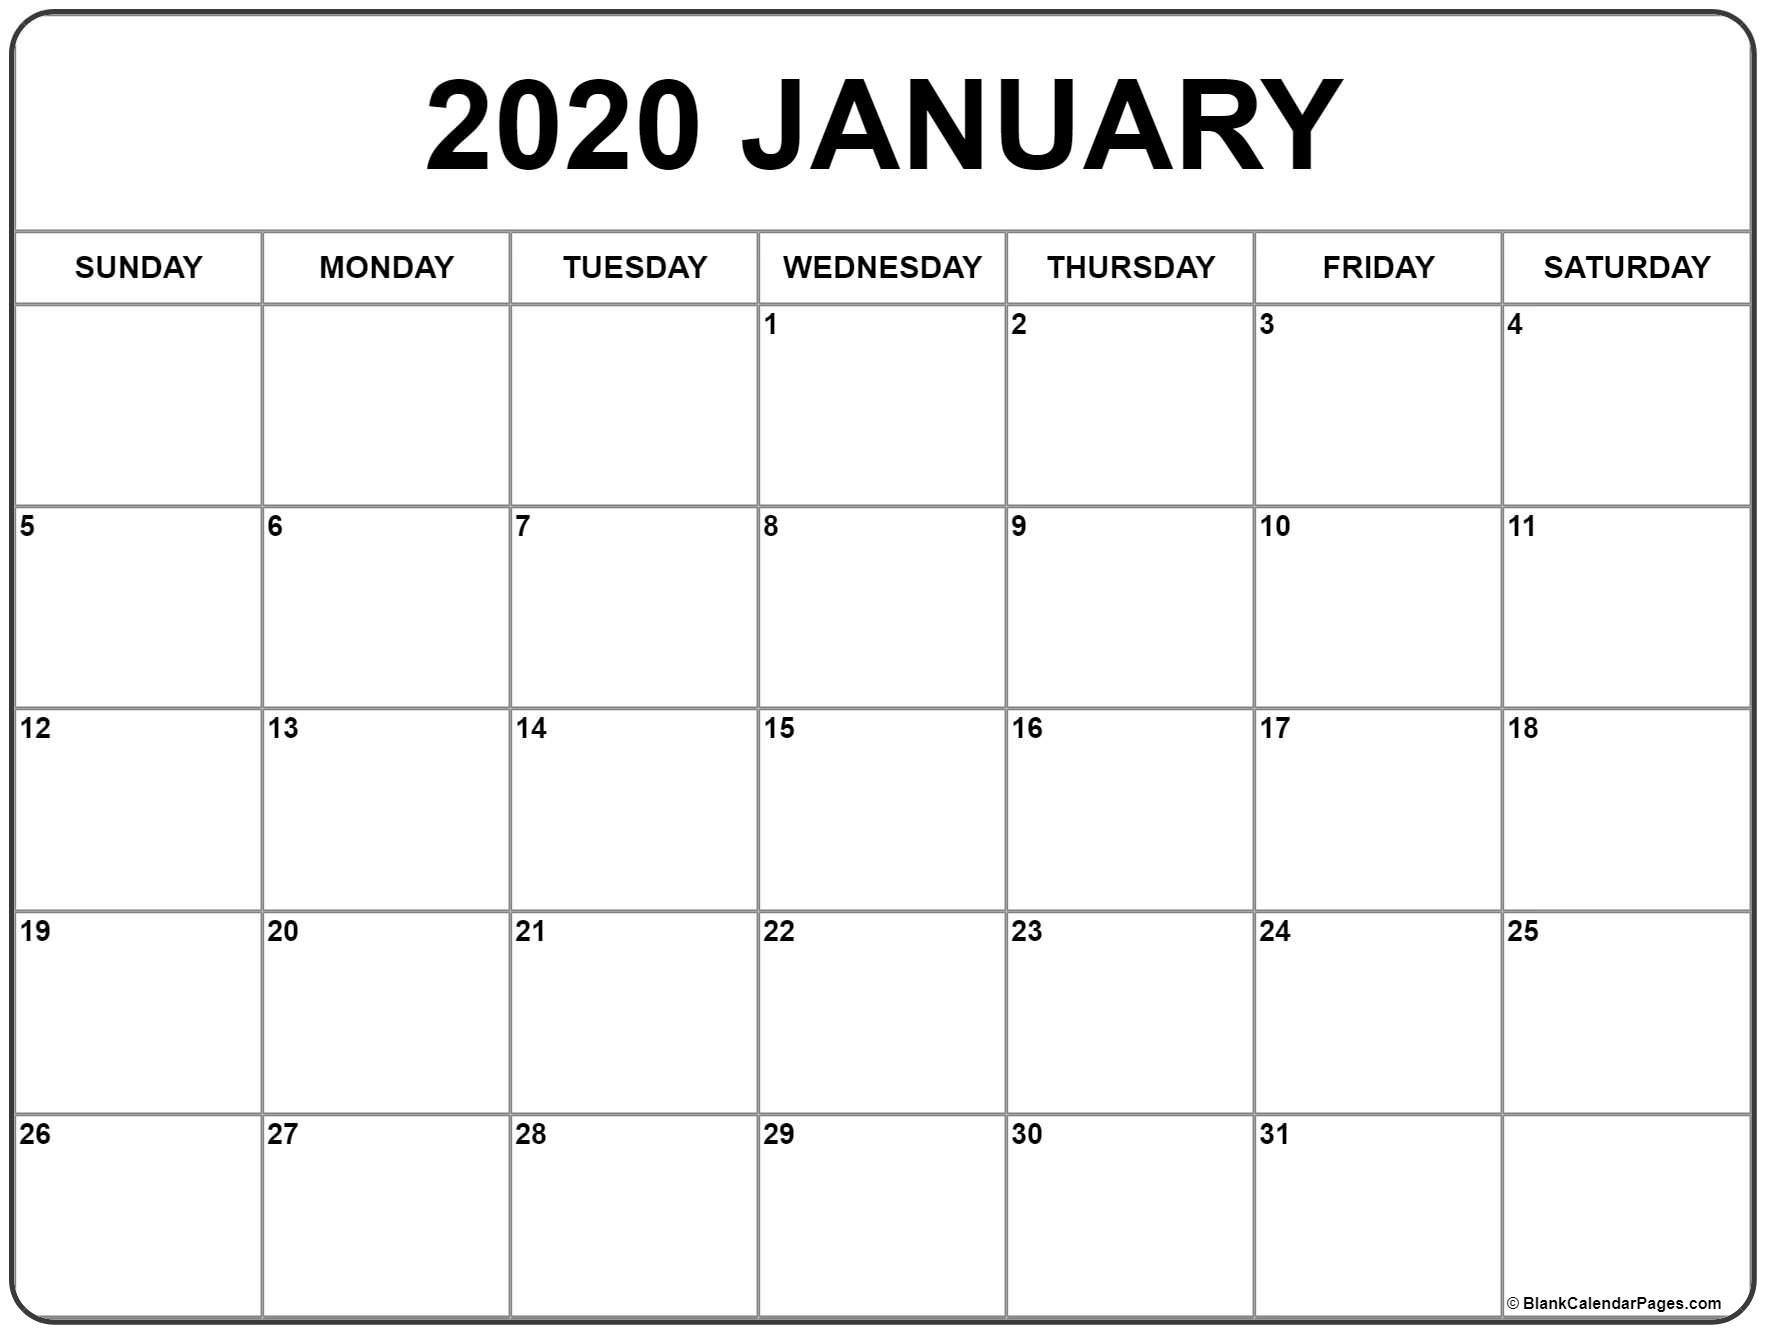 January 2020 Calendar | Free Printable Monthly Calendars  Free Printable Editable Calendars 2020